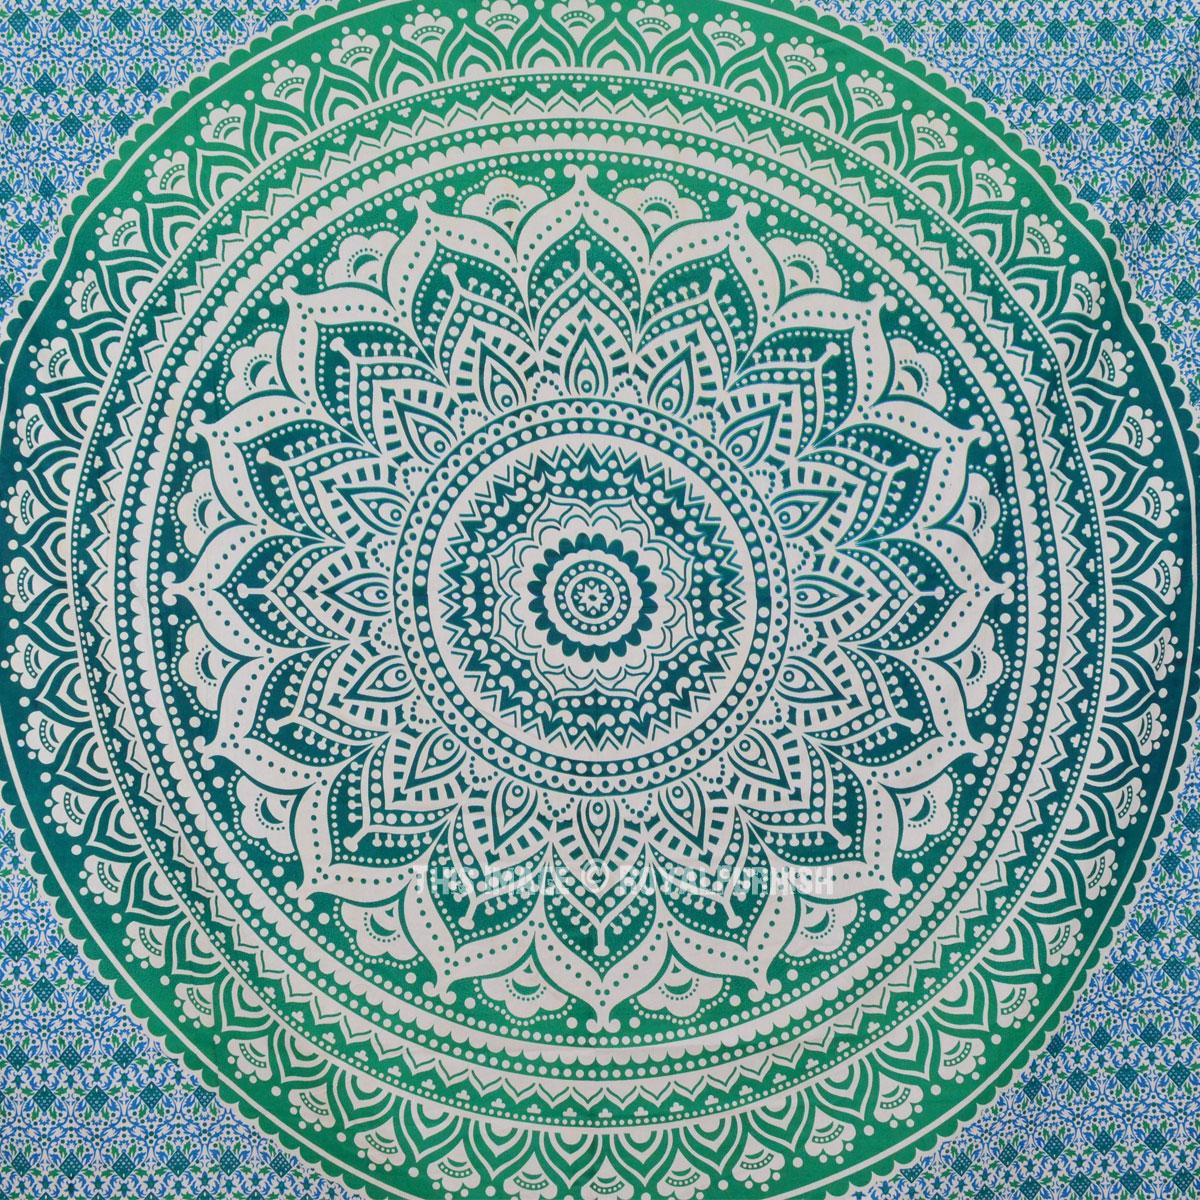 Sea Green Multi Ombre Tapestry Indian Mandala Bedding